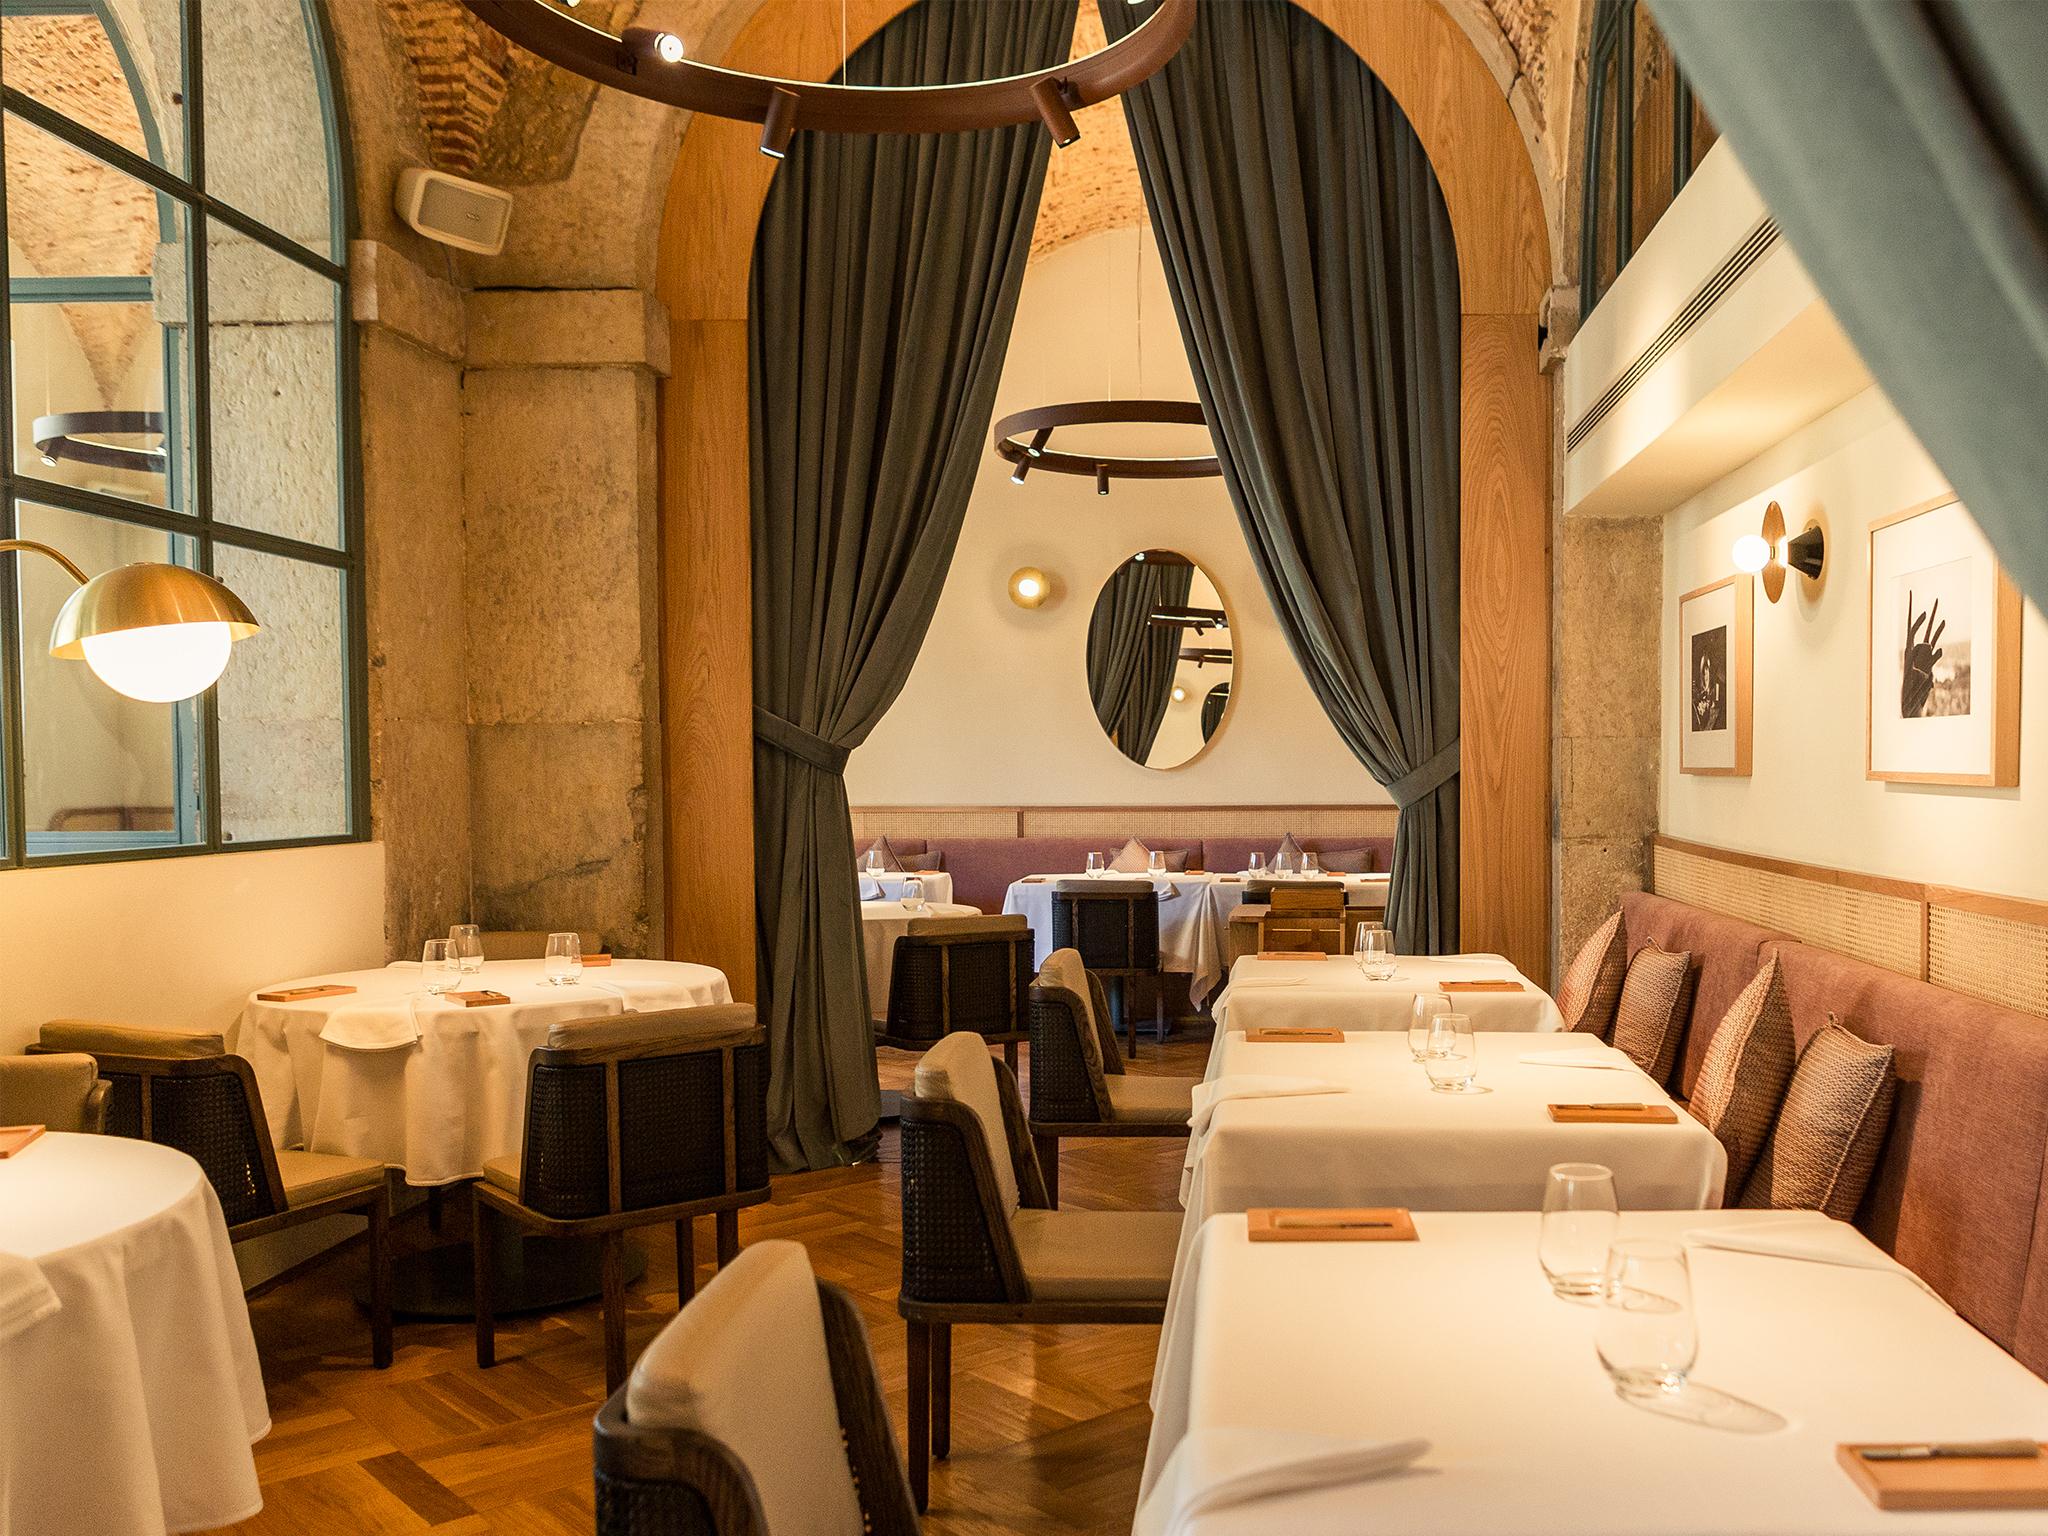 Os 10 restaurantes que marcaram a cidade na última década